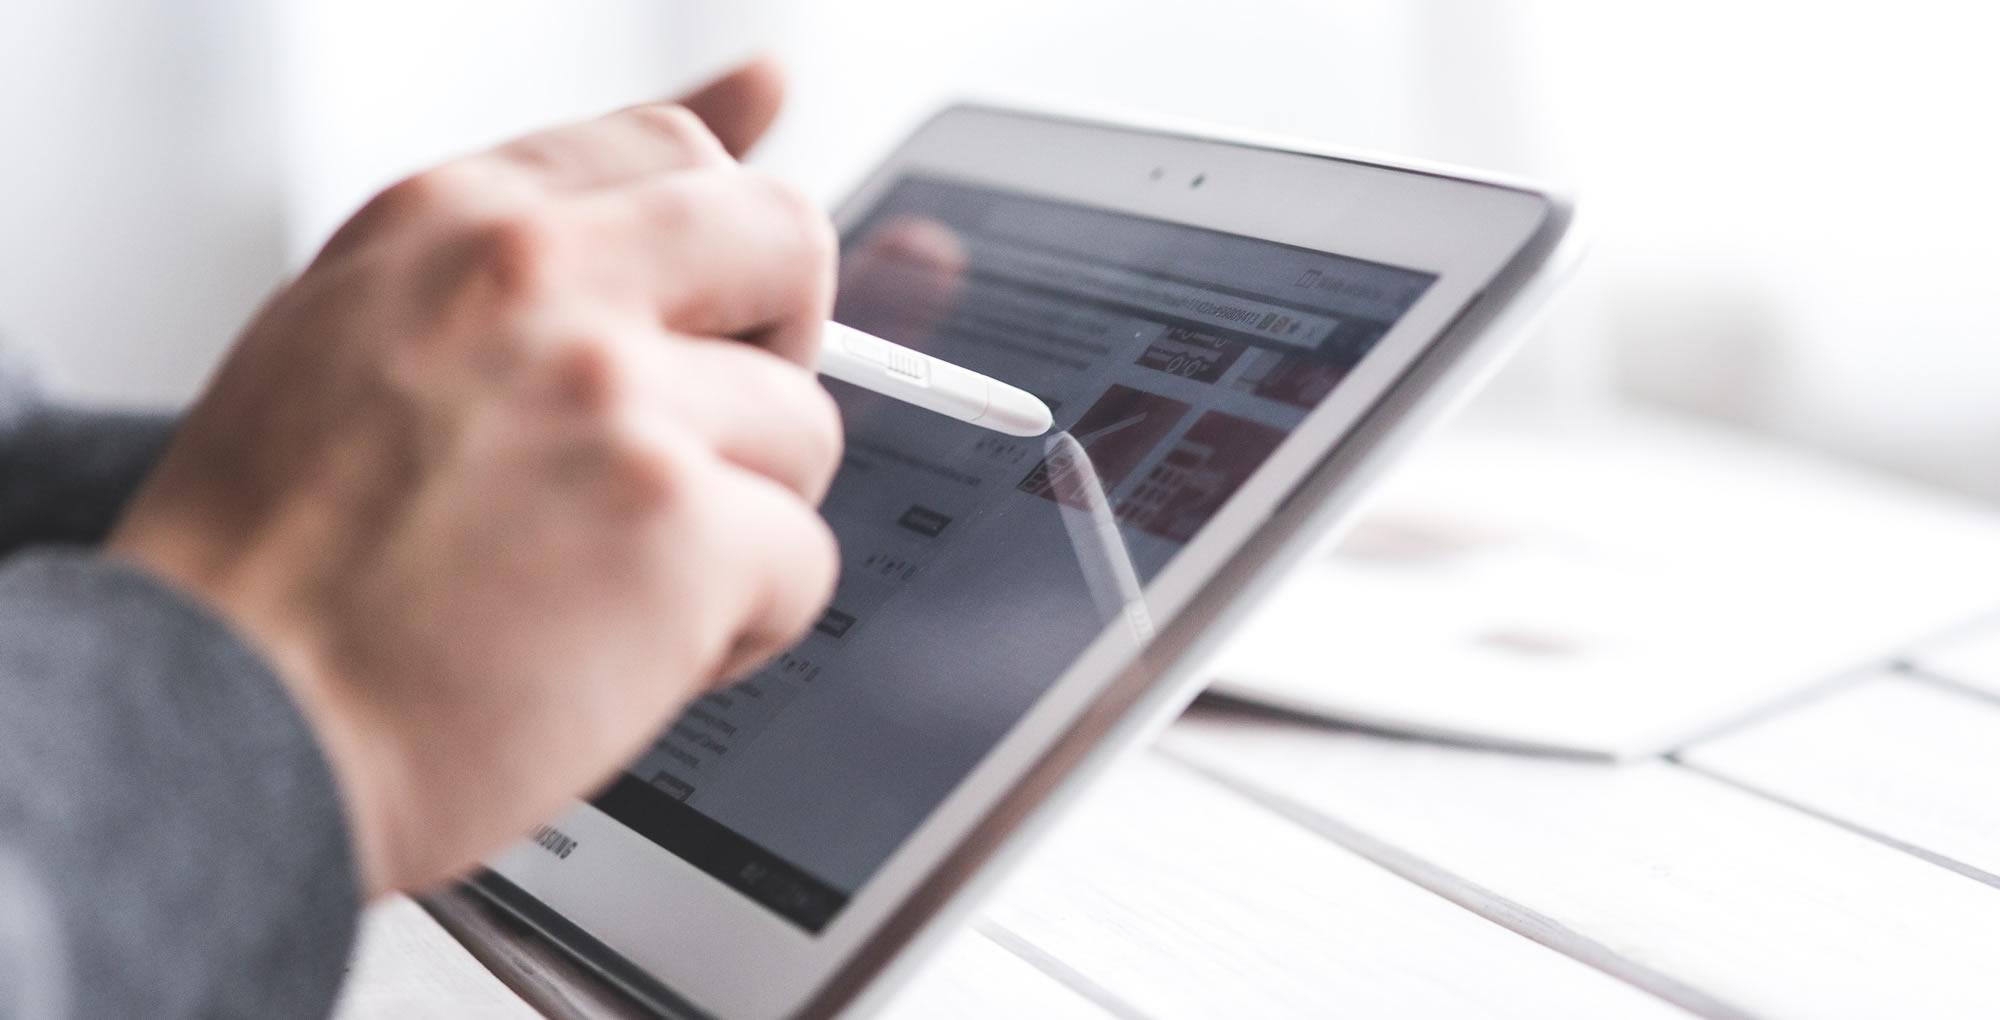 Samsung Tablet Quiz